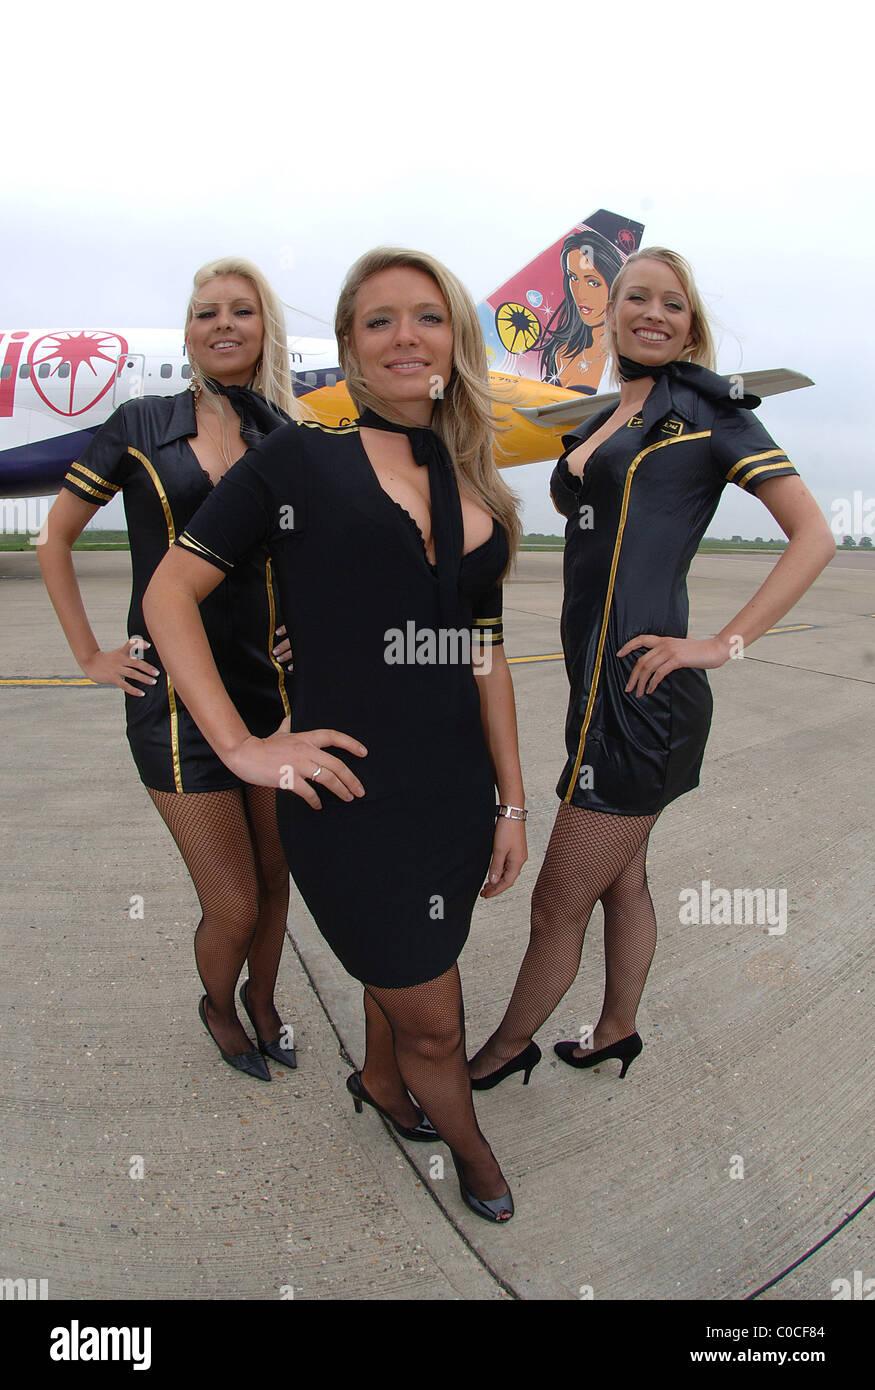 Www Crash Aerien Aero Les Avions C Est Beau Les Filles